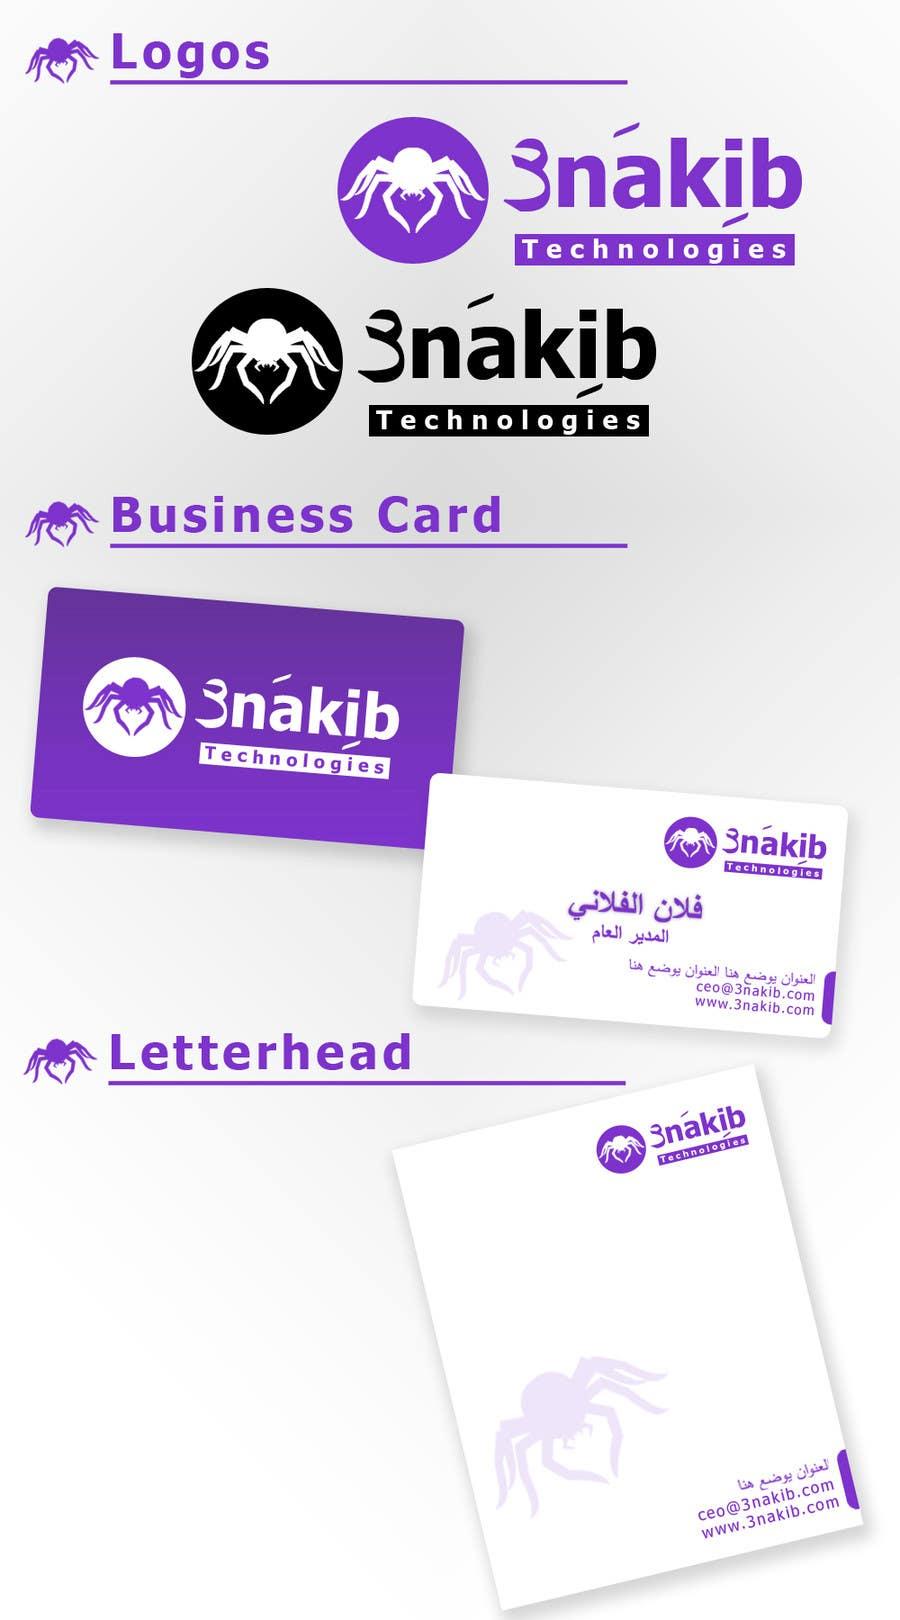 Kilpailutyö #41 kilpailussa Develop a Corporate Identity for 3nkaib Technologies (Spiders)